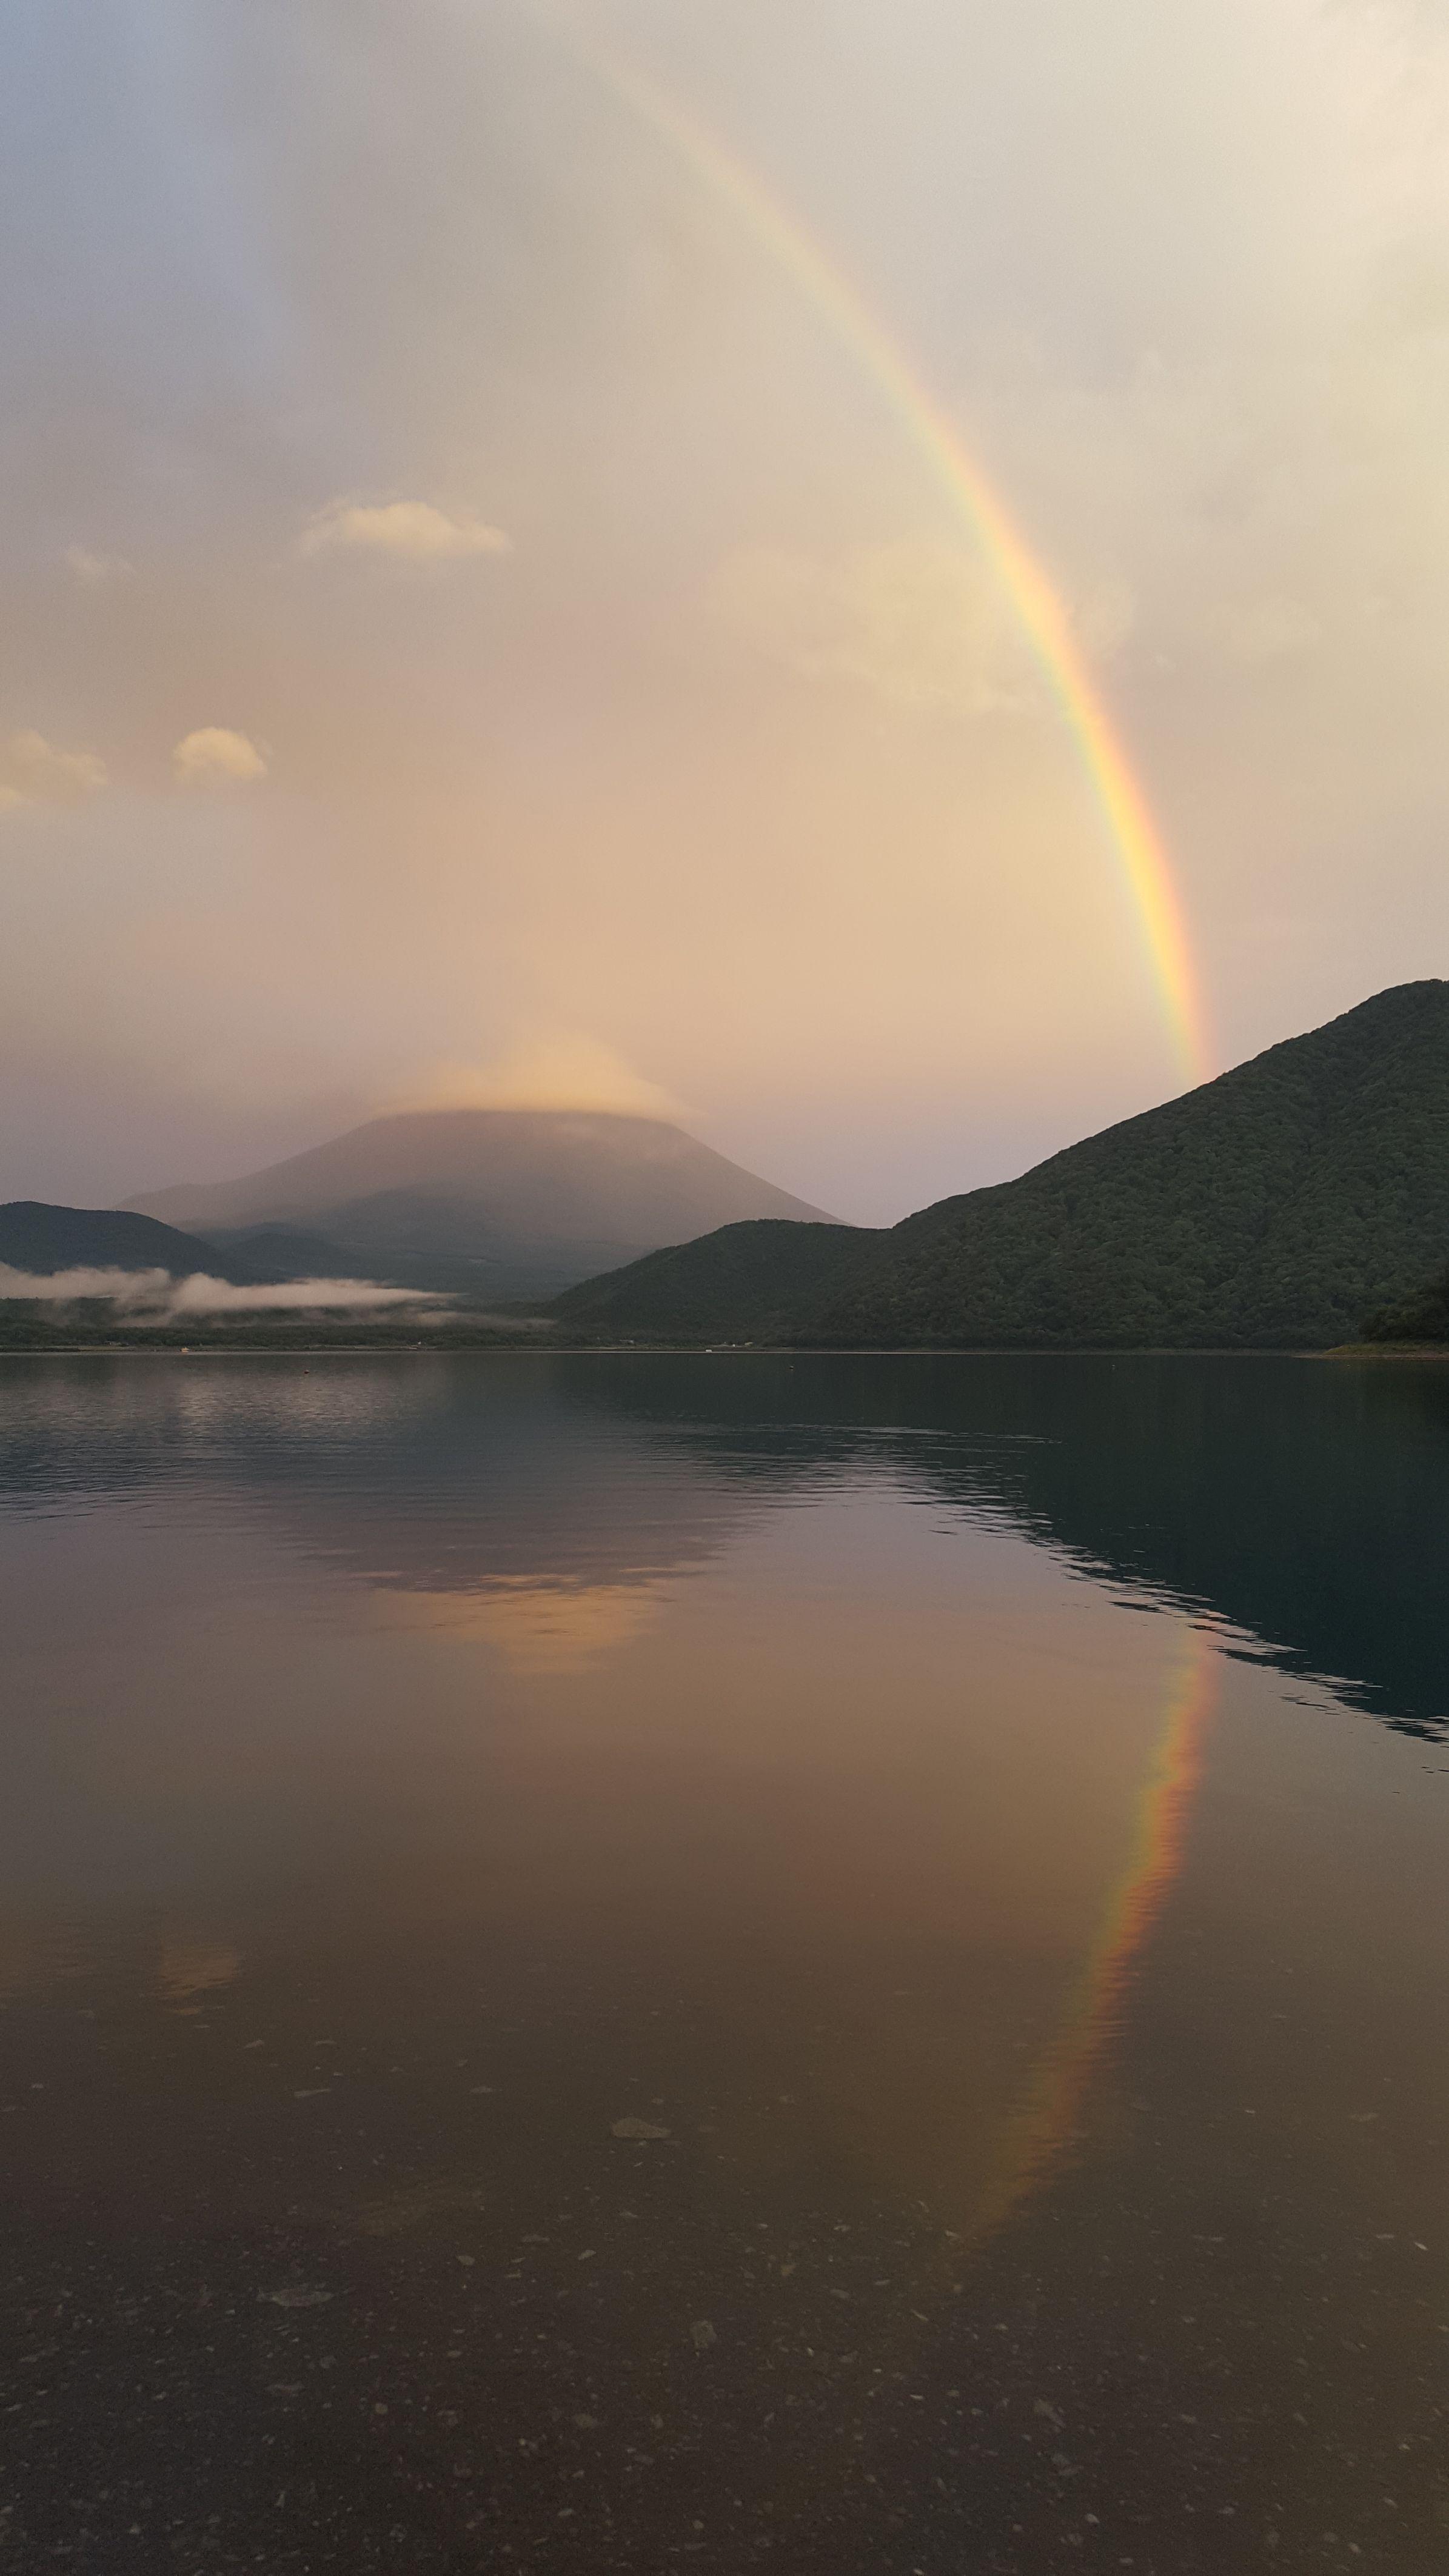 Rainbow over Mt. Fuji